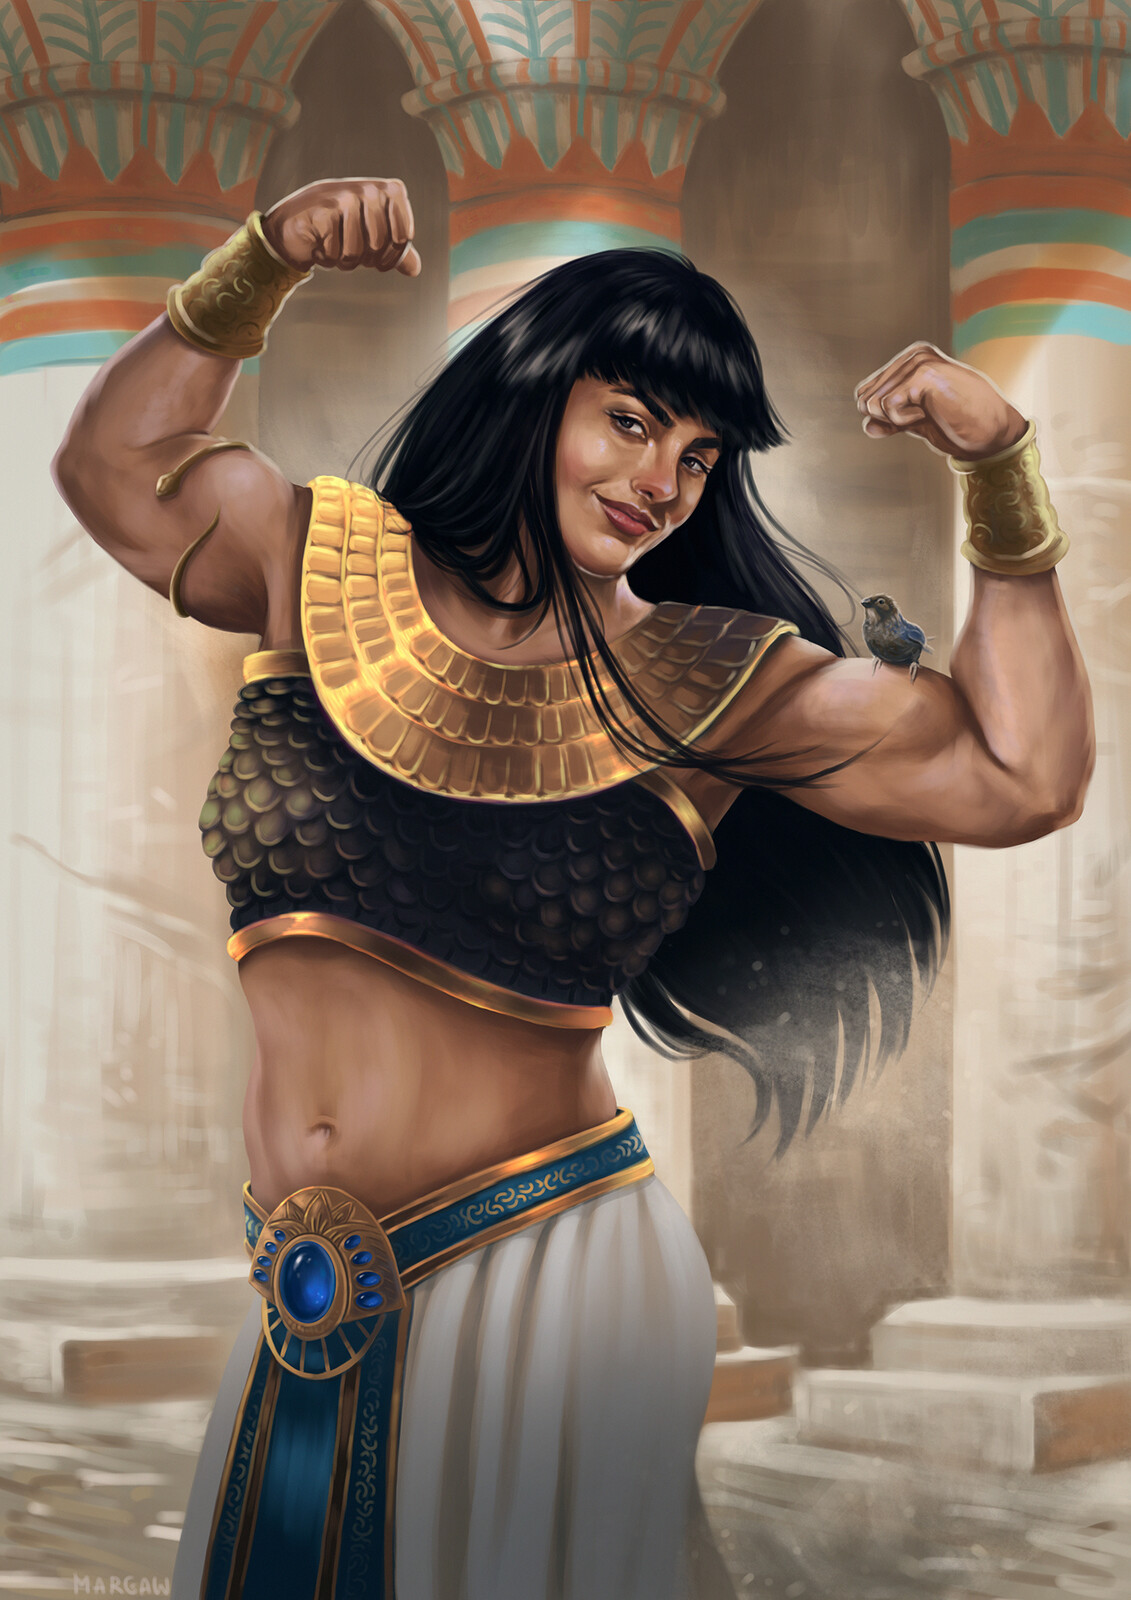 Neith-Khered, Child of the Goddess